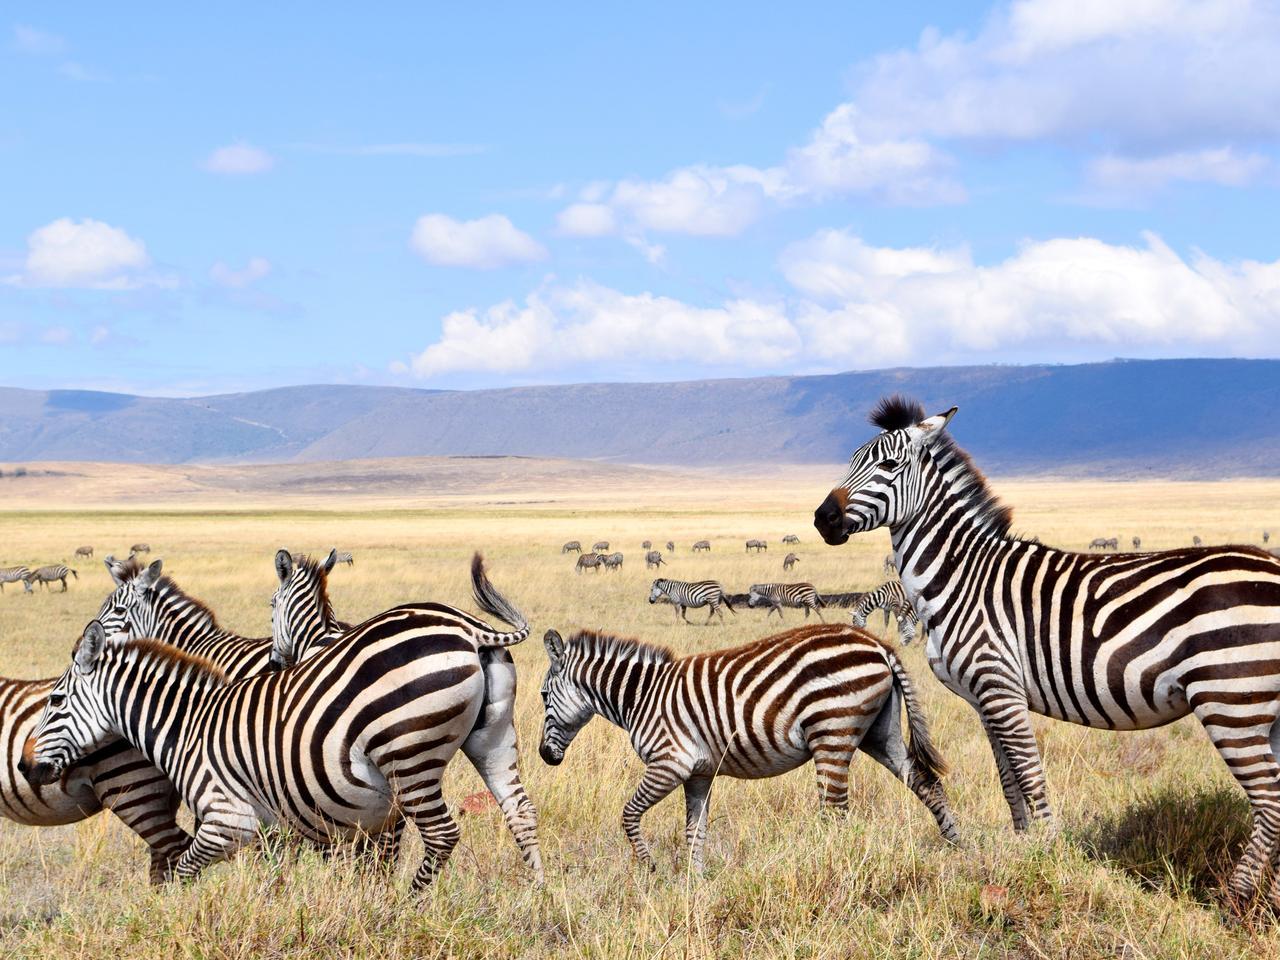 Zebras in Ngorongoro crater, Tanzania